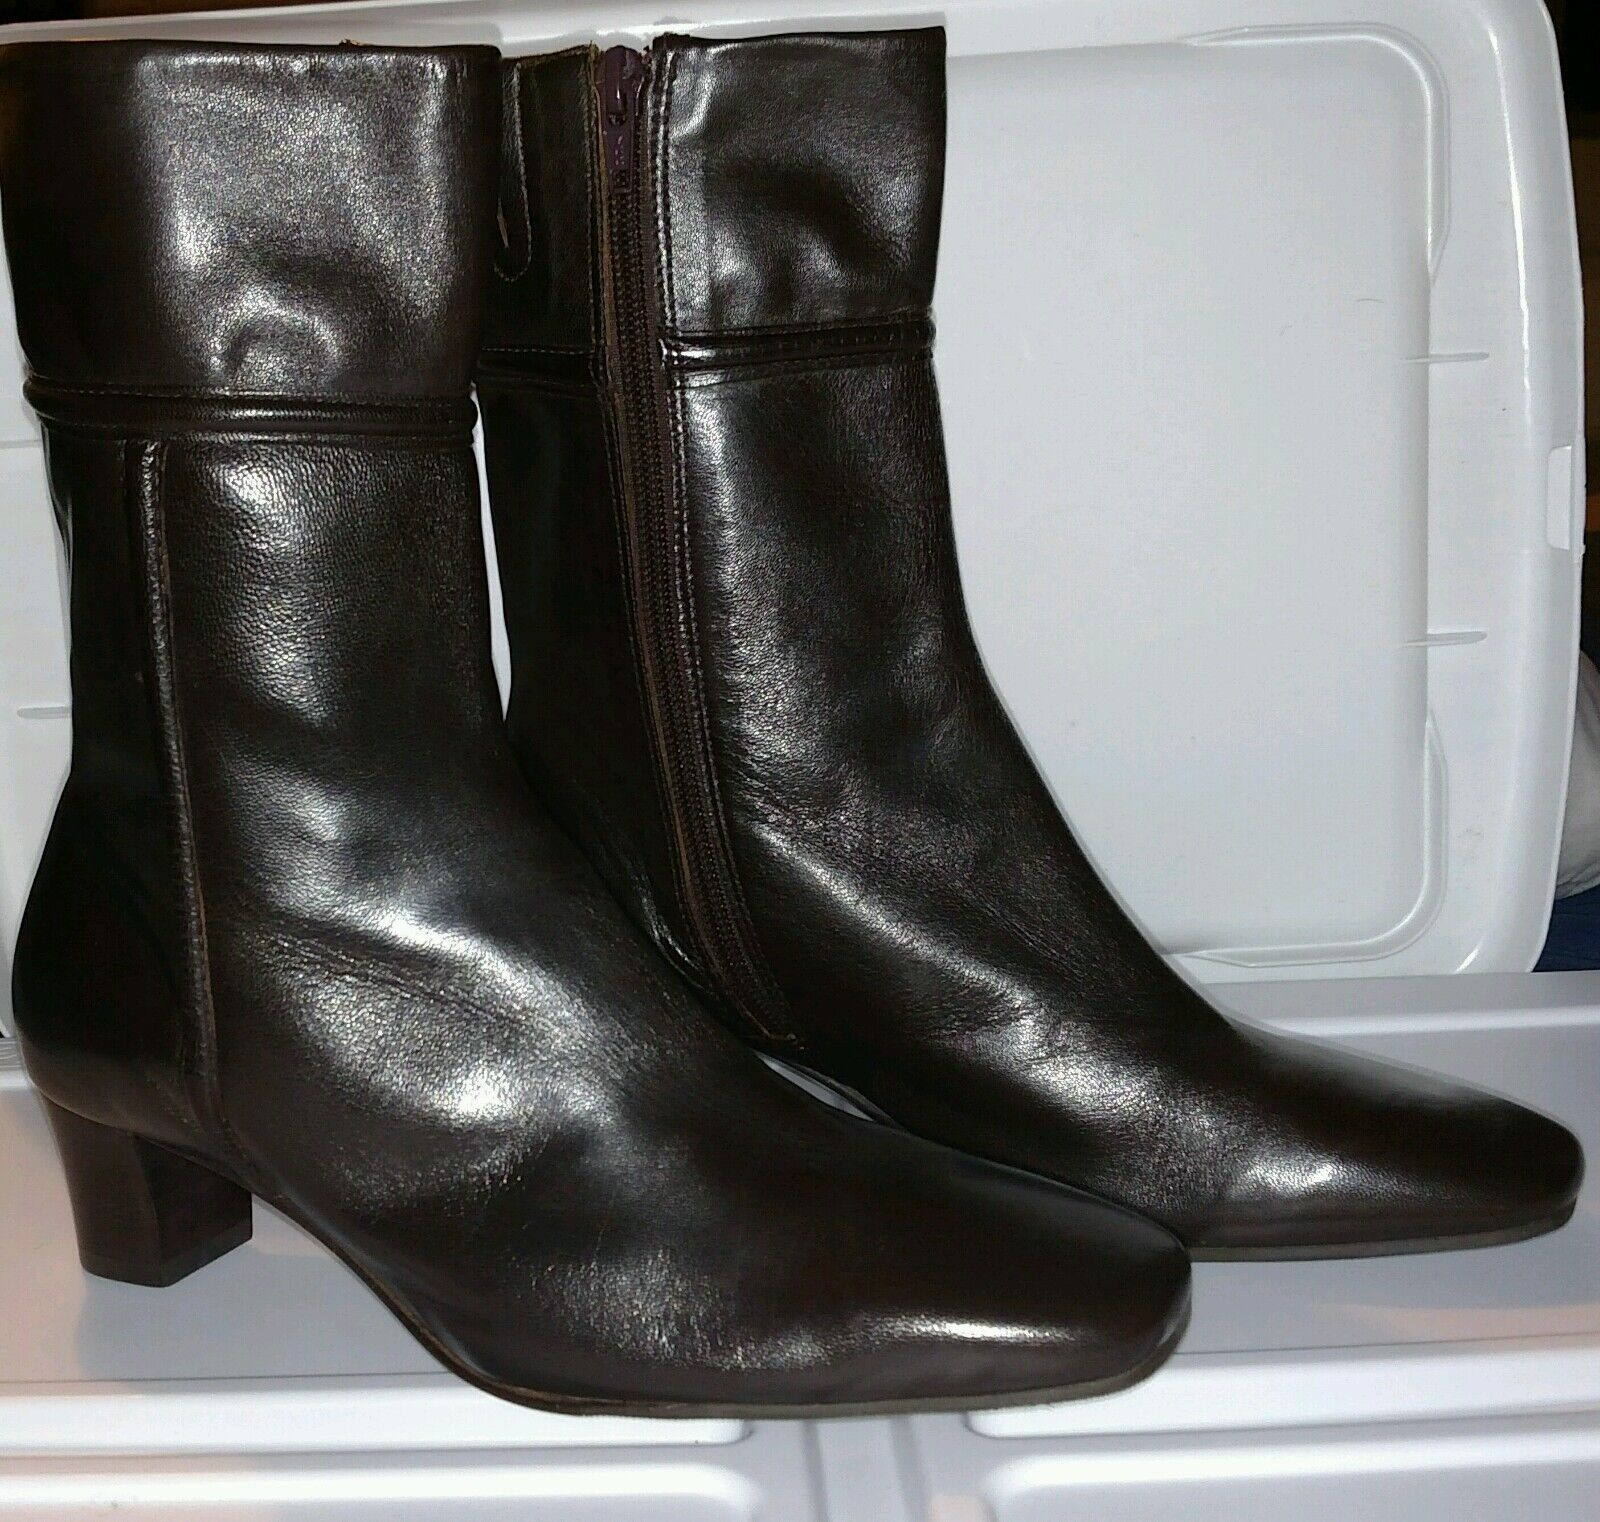 ANTONIO MELANI Brown Leather Womens Boots Heels 6M Stretch Vero Cuoio Italy Zip